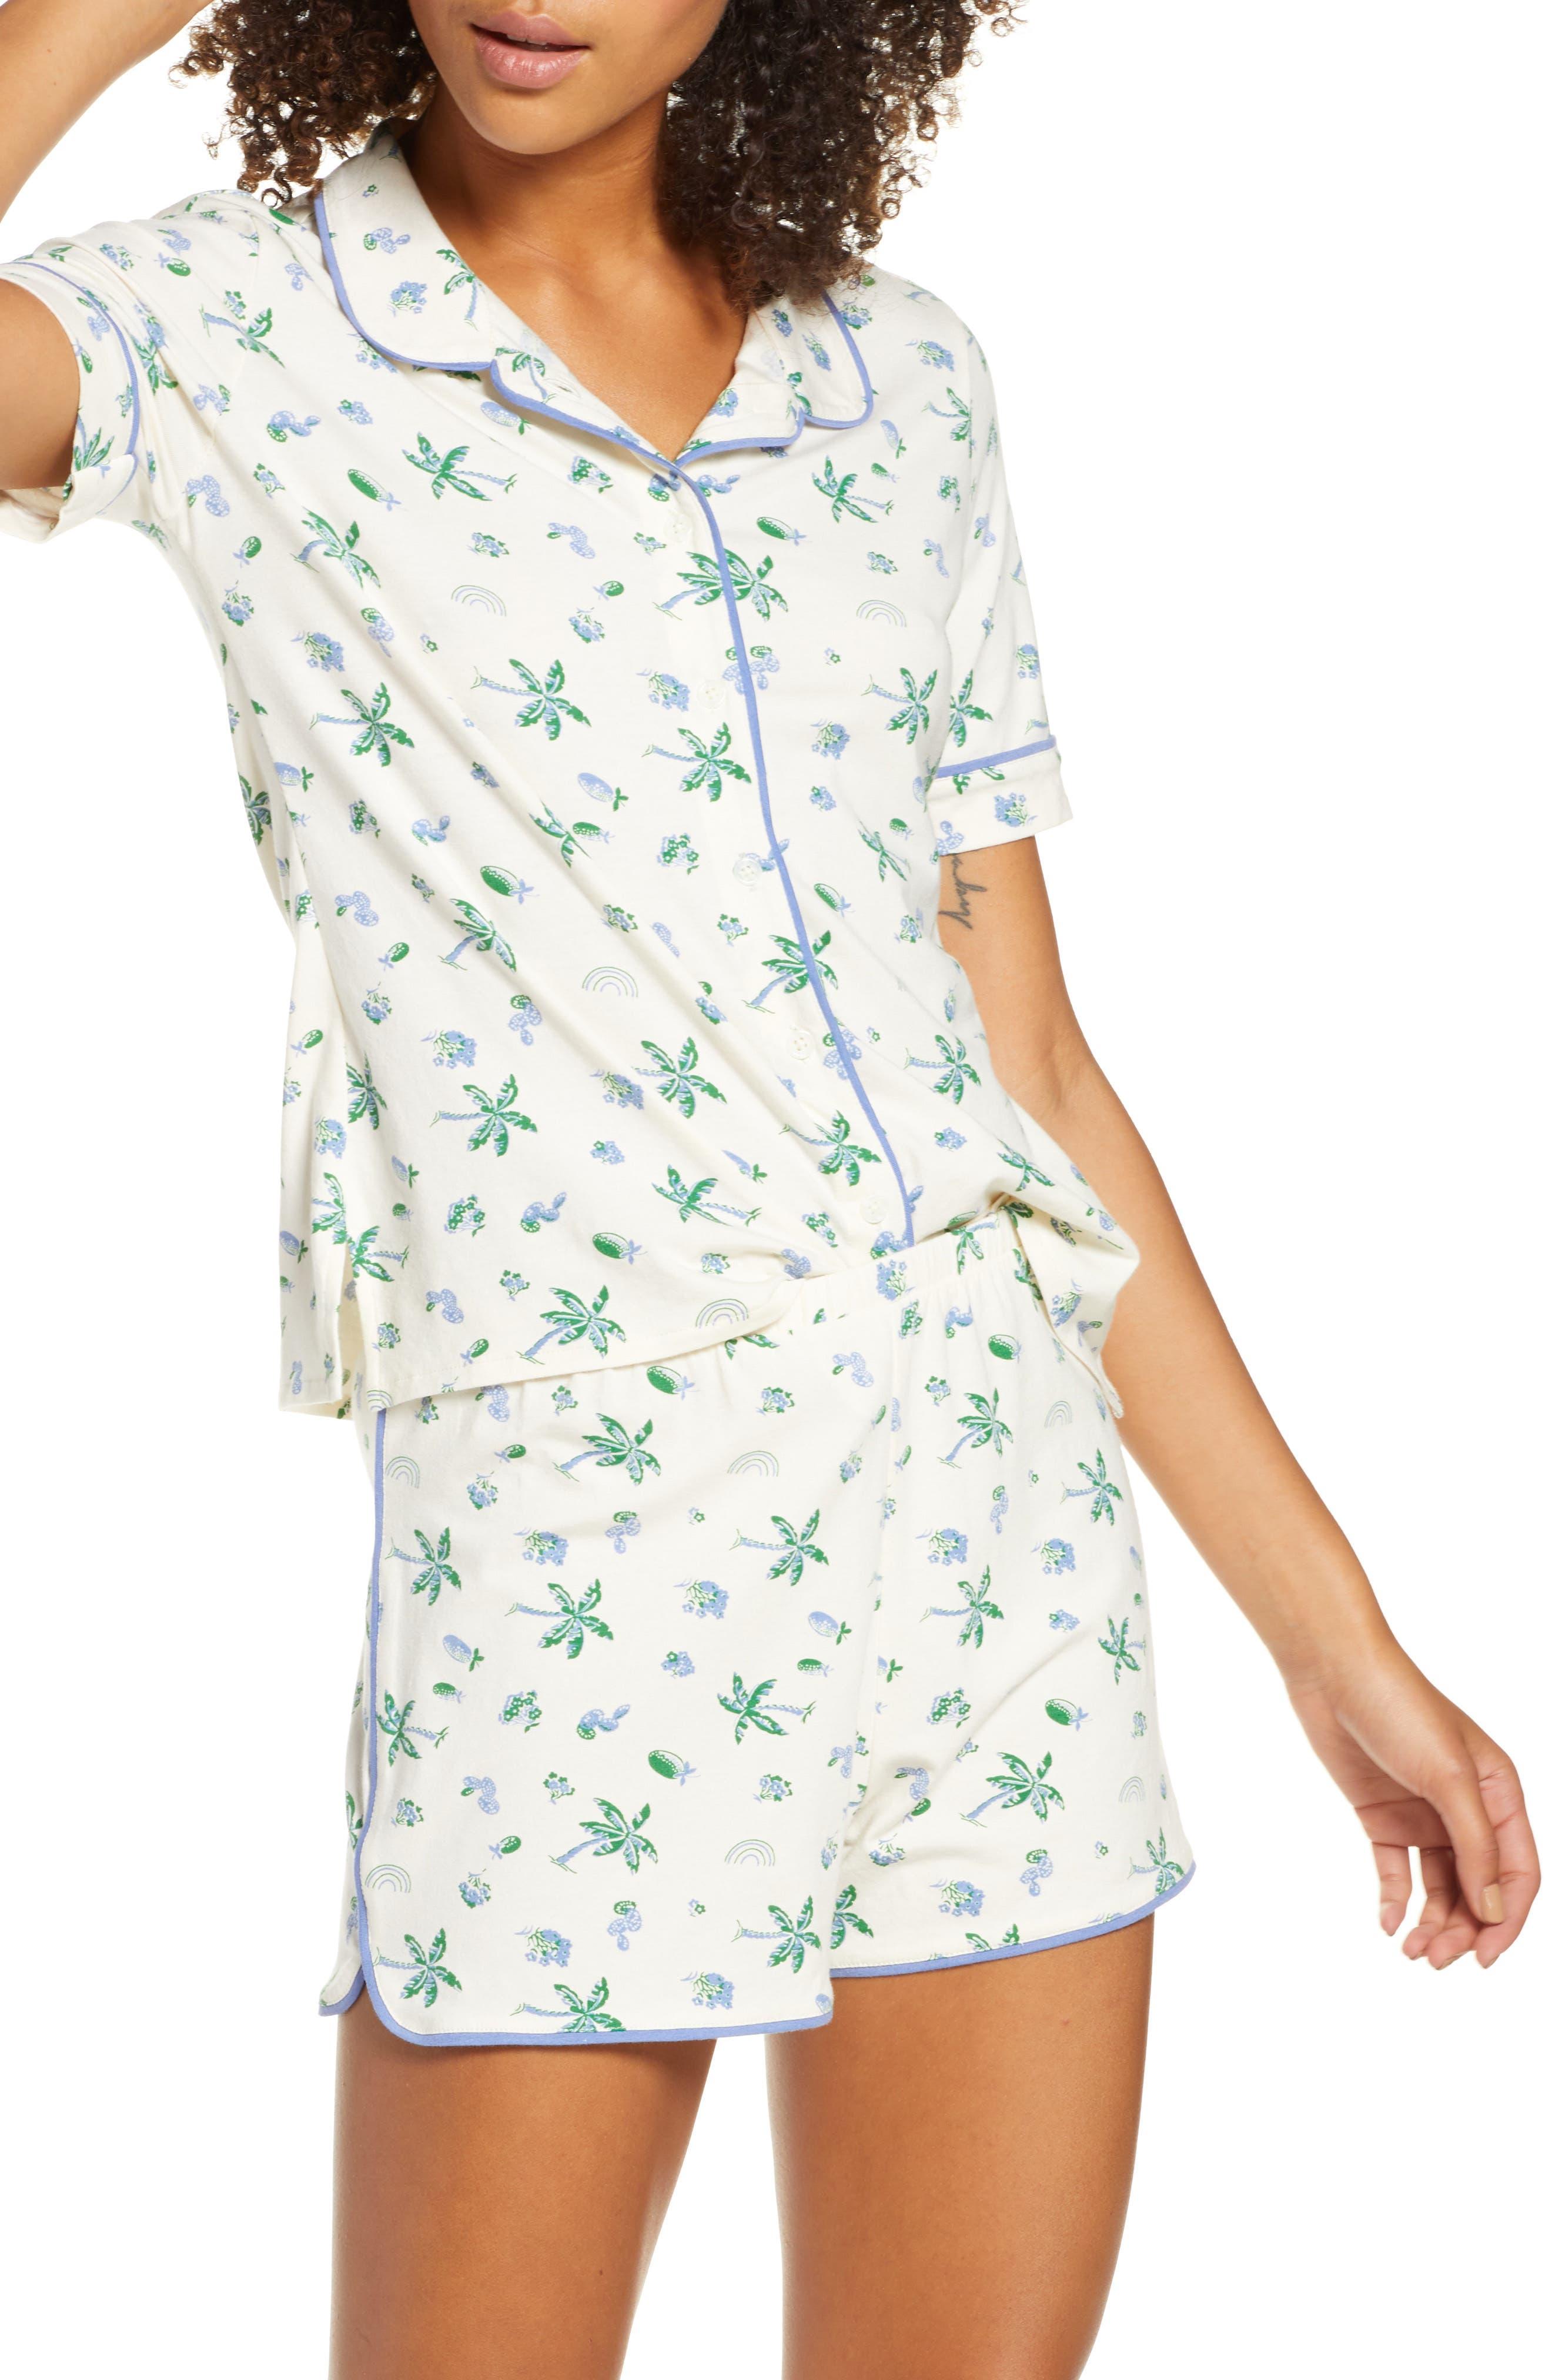 Madewell Palm Print Knit Bedtime Short Pajamas